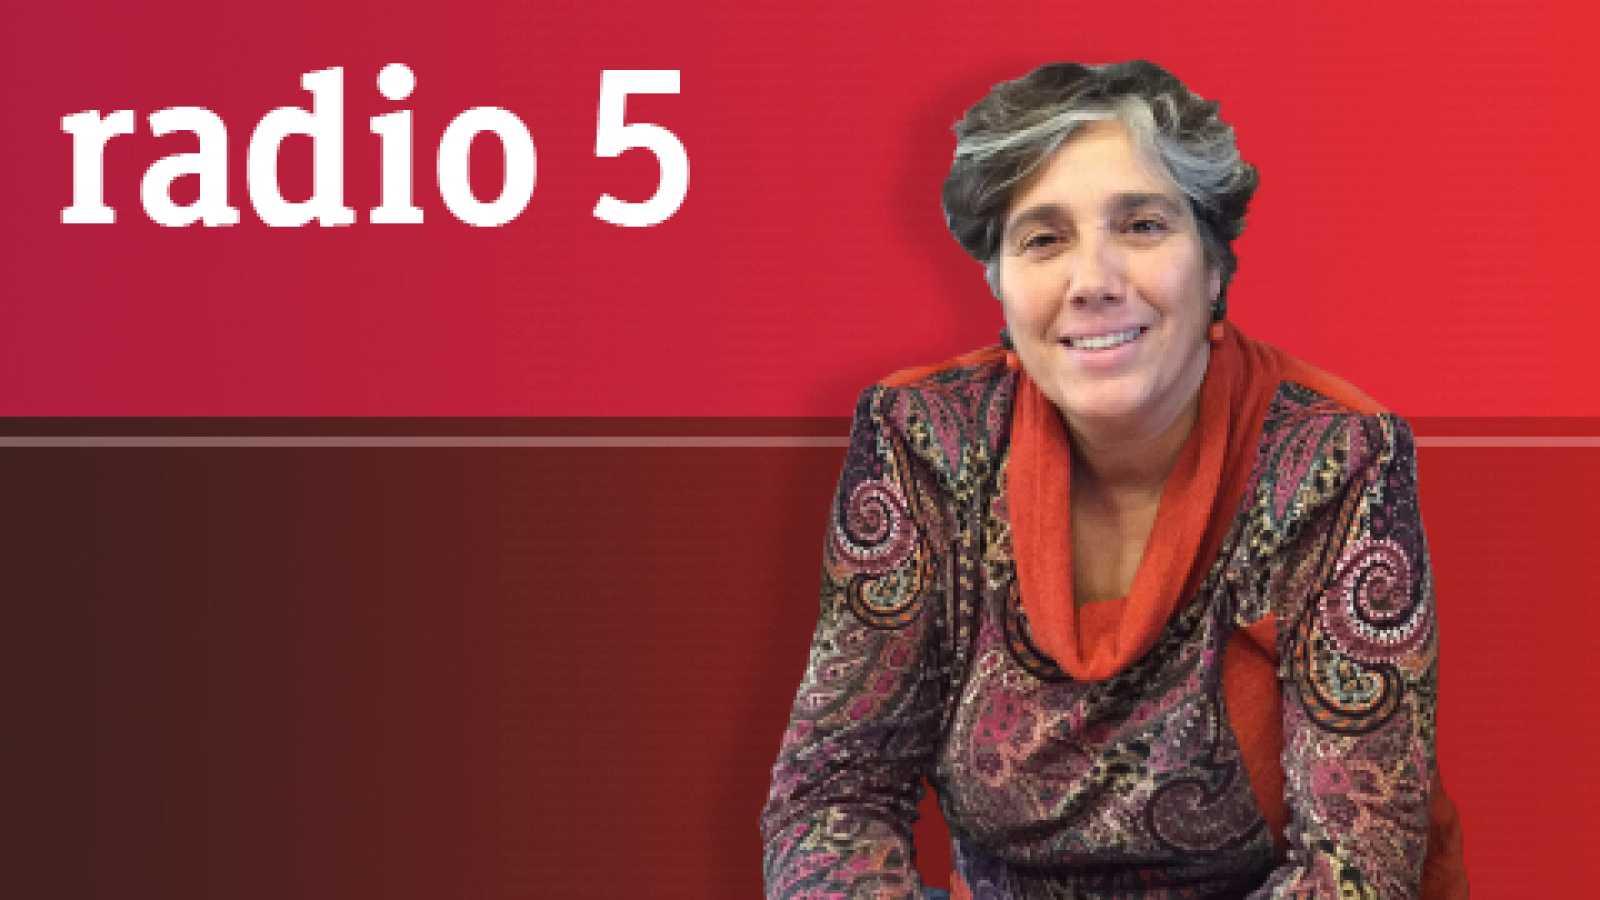 Canal Europa en Radio 5  - Agenda cultural diciembre 2019 - 10/12/19 - escuchar ahora